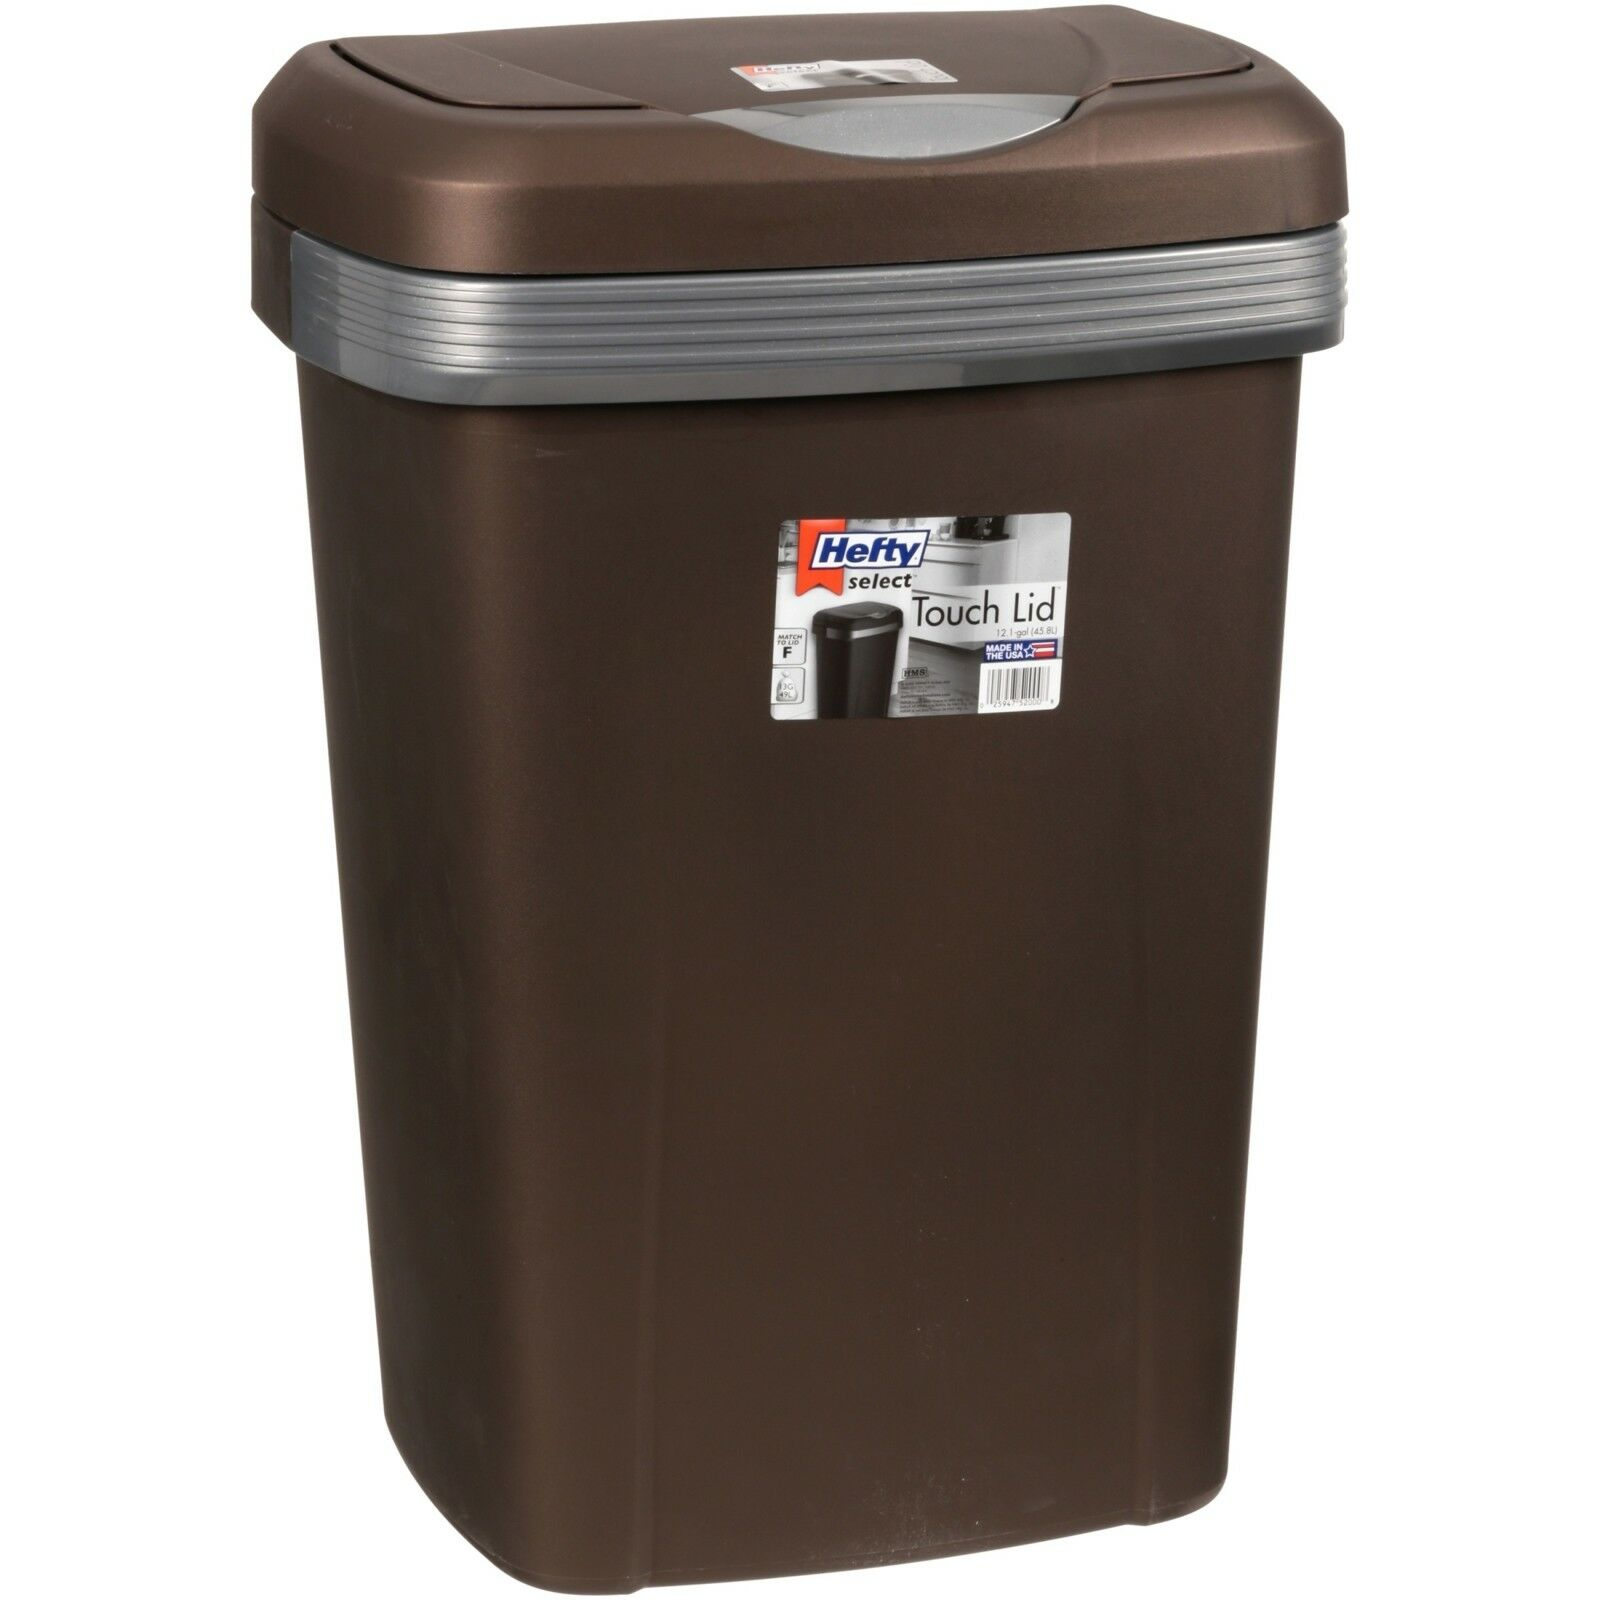 Kitchen Trash Can 10 Gallon Garbage Bin Waste Basket Touch Lid Plastic Black NEW